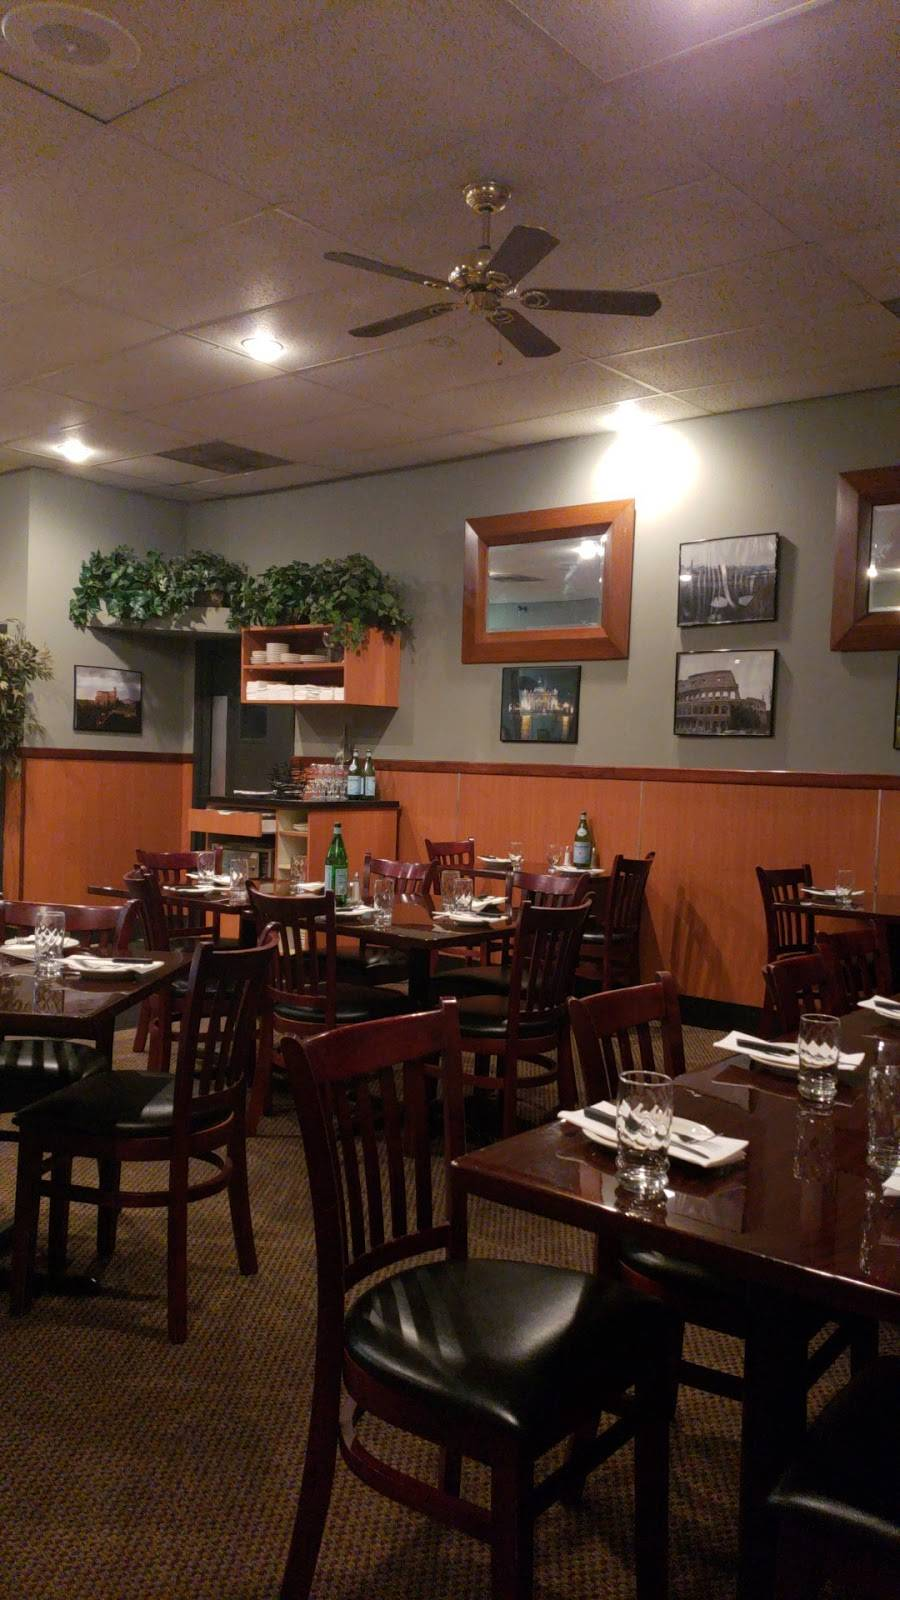 Cascarinos   restaurant   121 Hawkins Dr, Montgomery, NY 12549, USA   8454571014 OR +1 845-457-1014